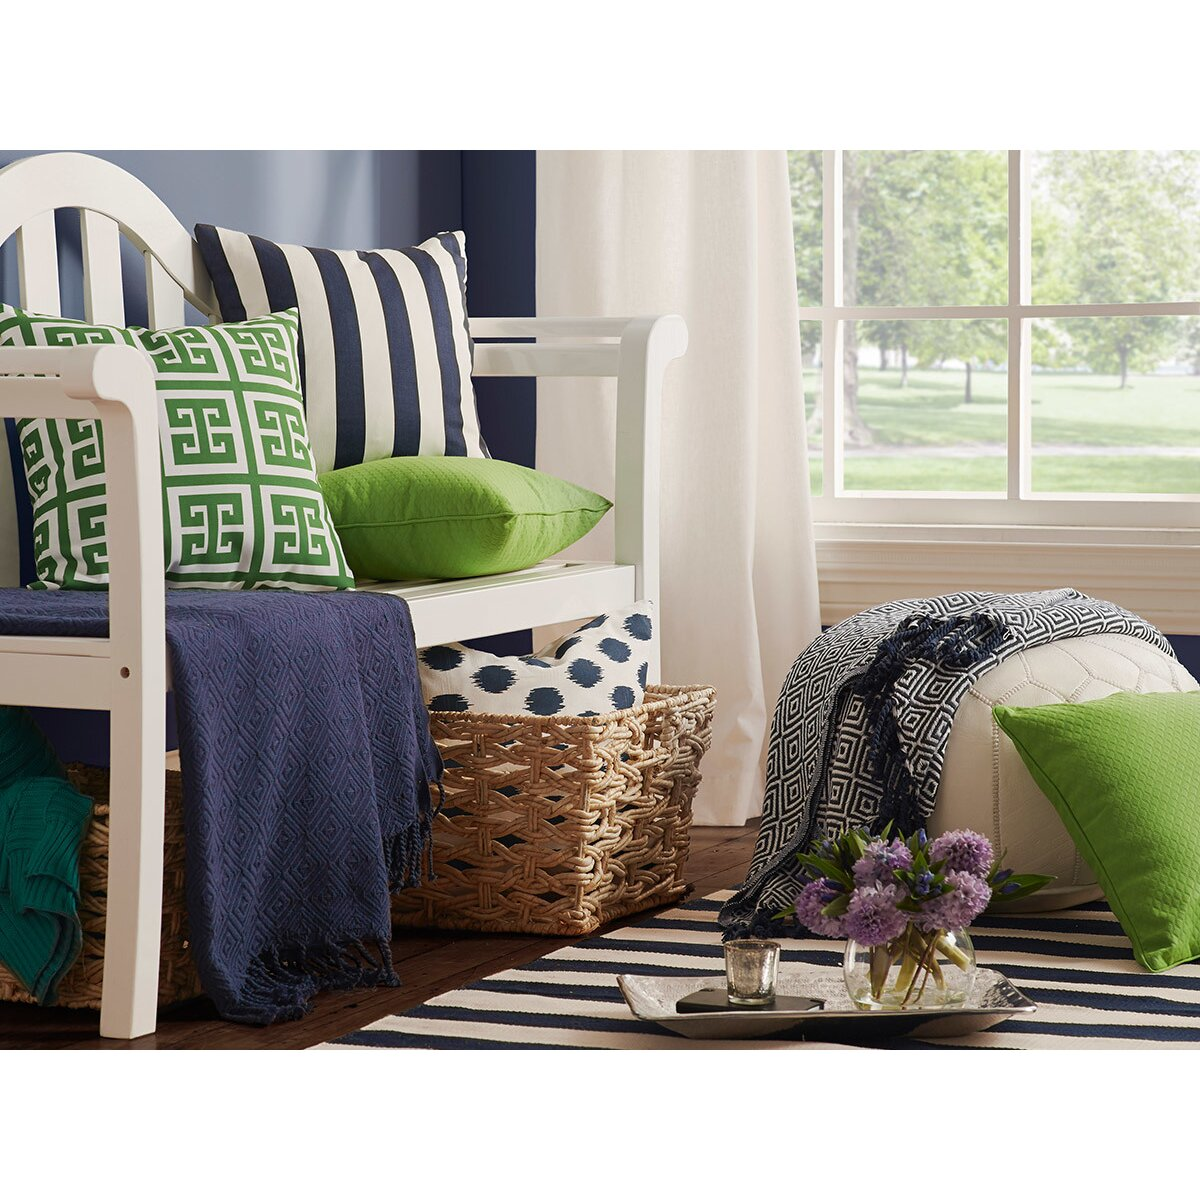 dash and albert rugs catamaran ivory navy striped area rug allmodern. Black Bedroom Furniture Sets. Home Design Ideas